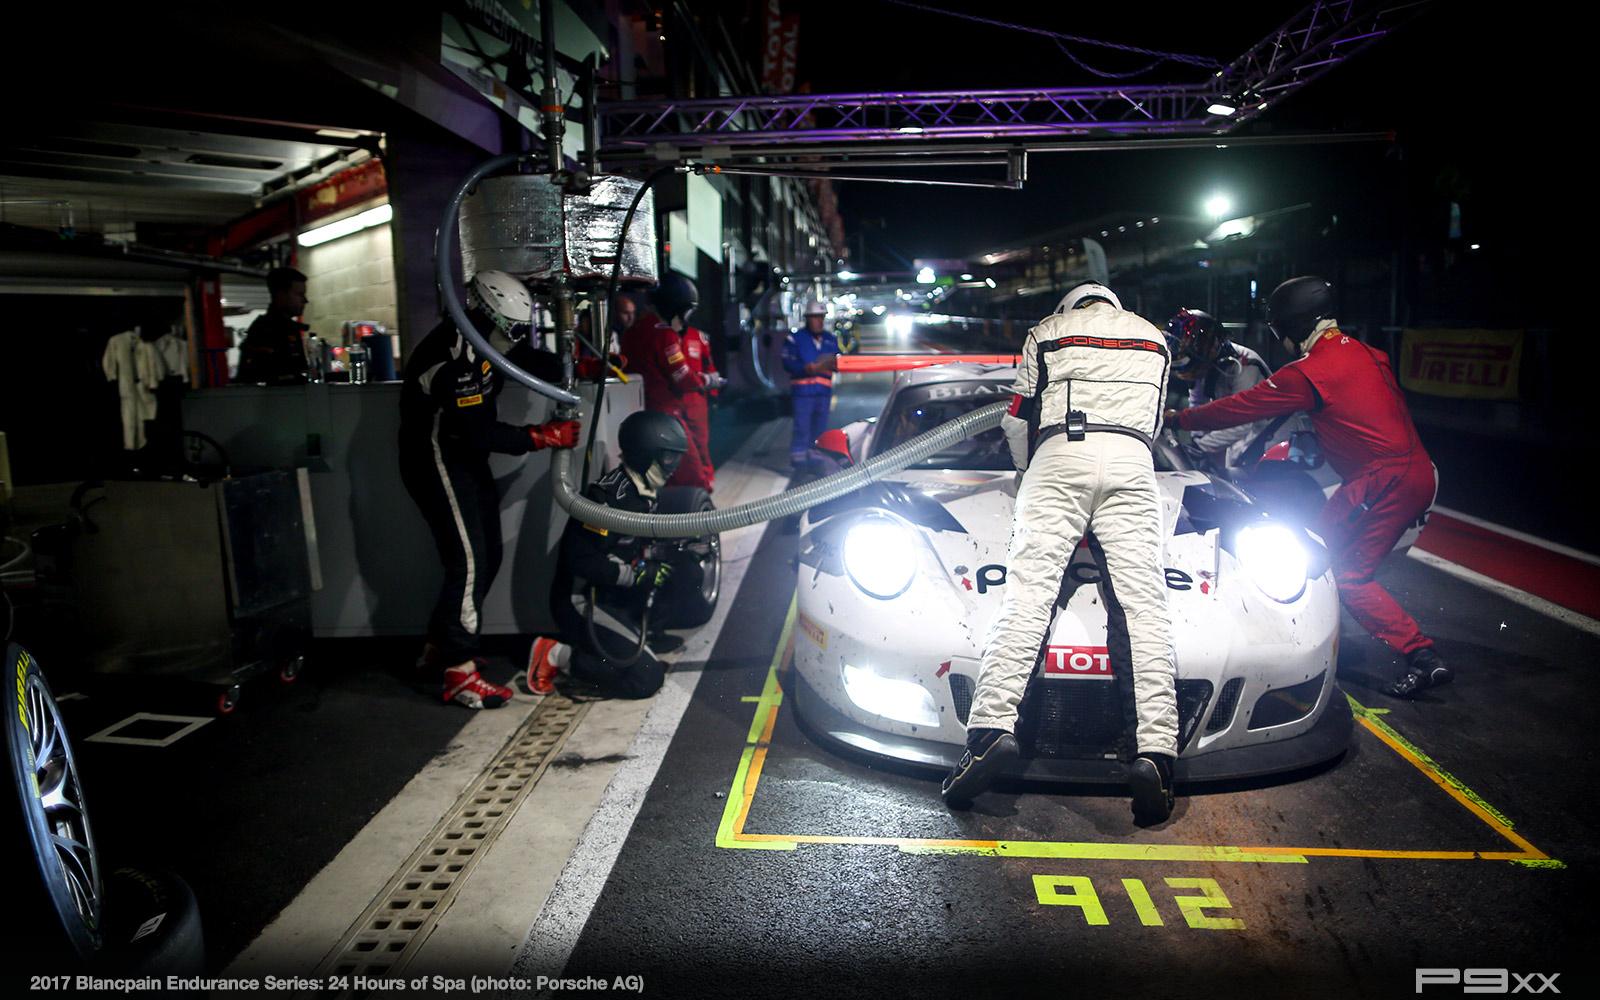 2017-24-Hours-of-Spa-Porsche-364